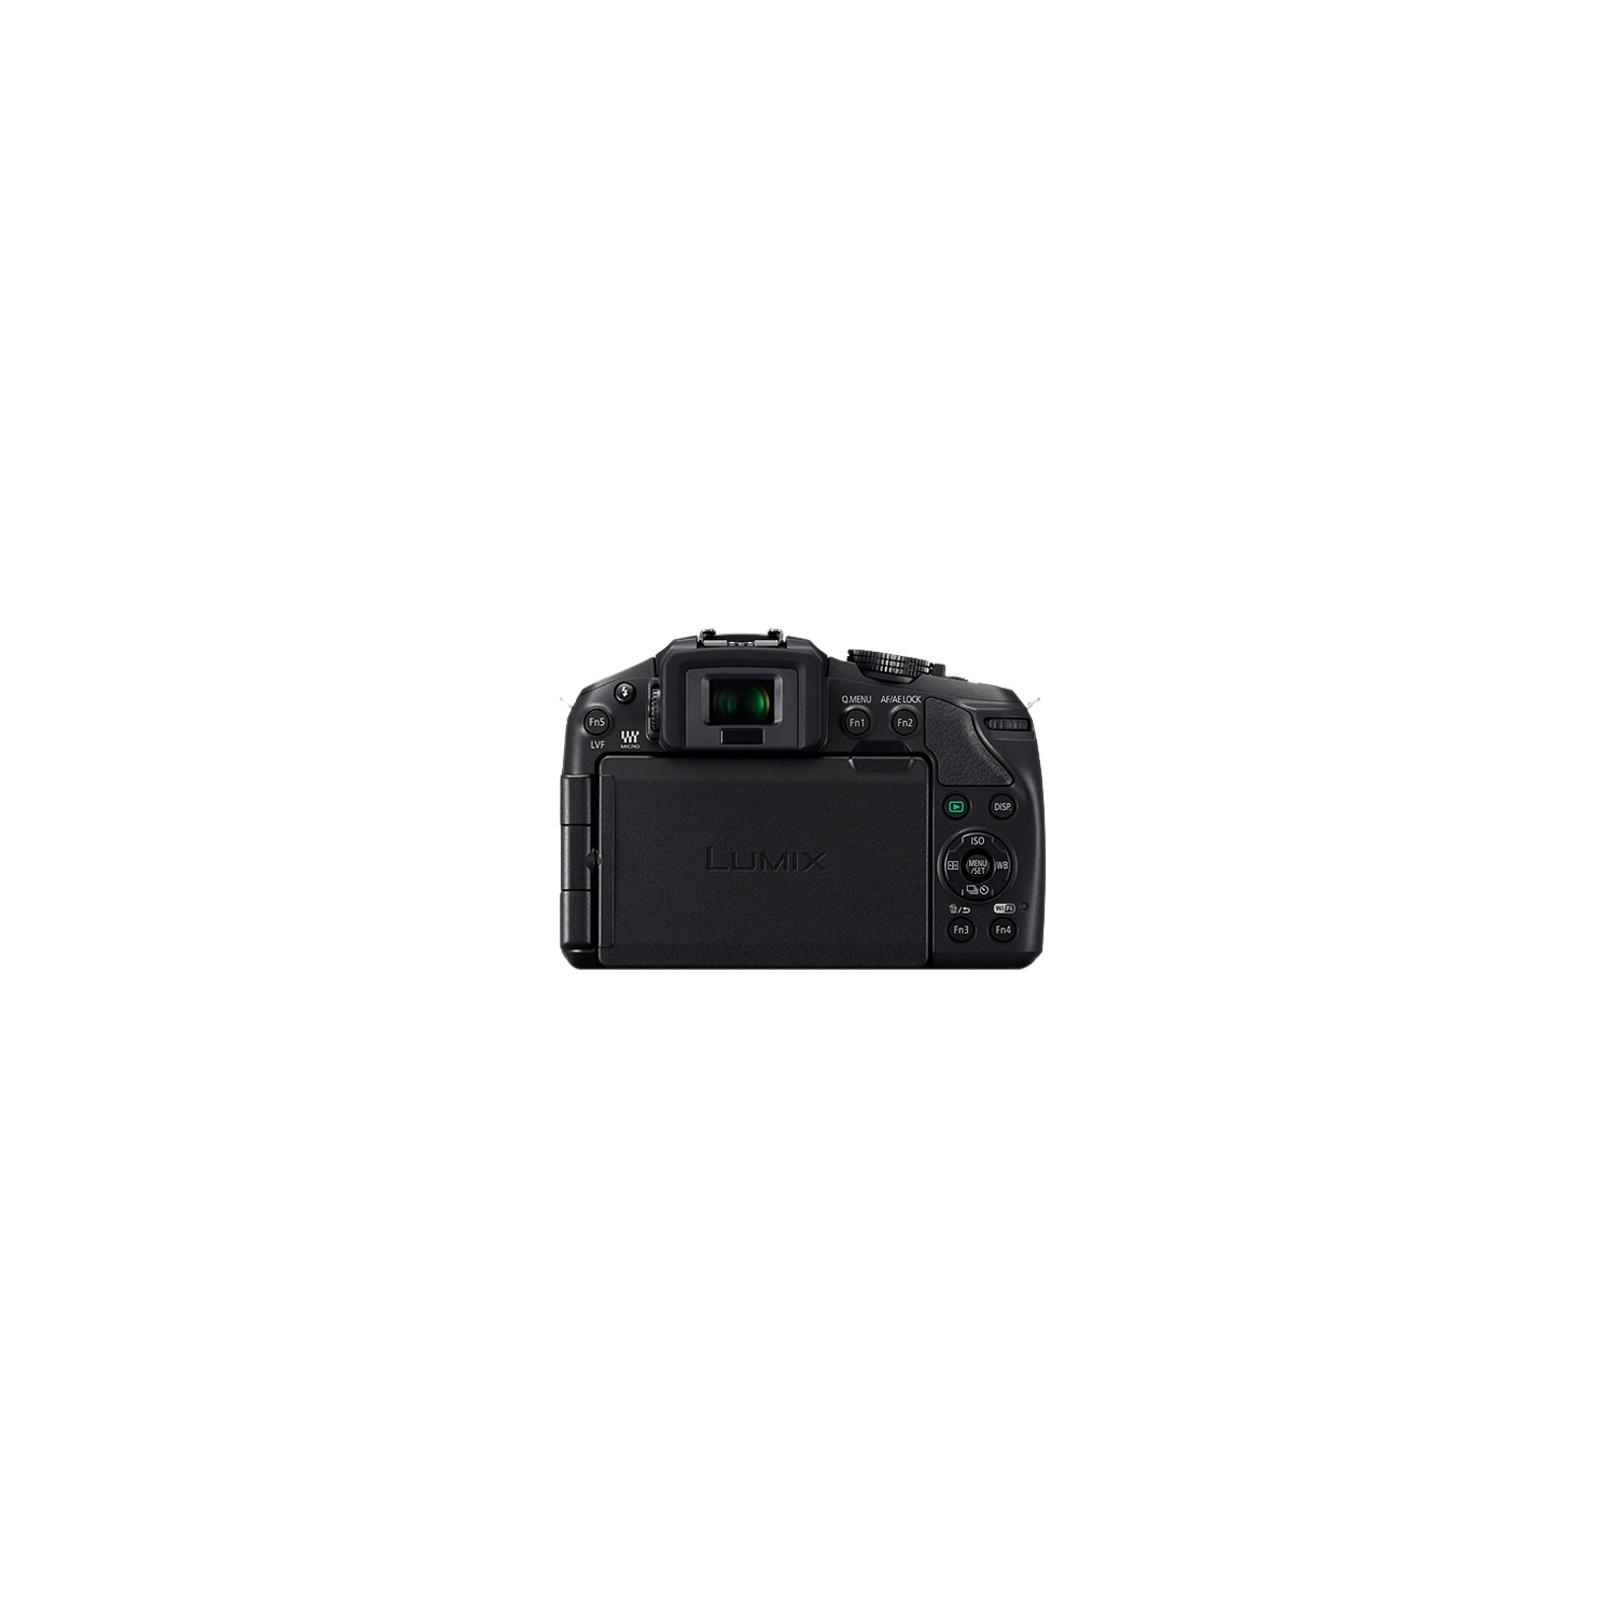 Цифровой фотоаппарат PANASONIC DMC-G6 14-140mm Kit Black (DMC-G6HEE-K) изображение 7